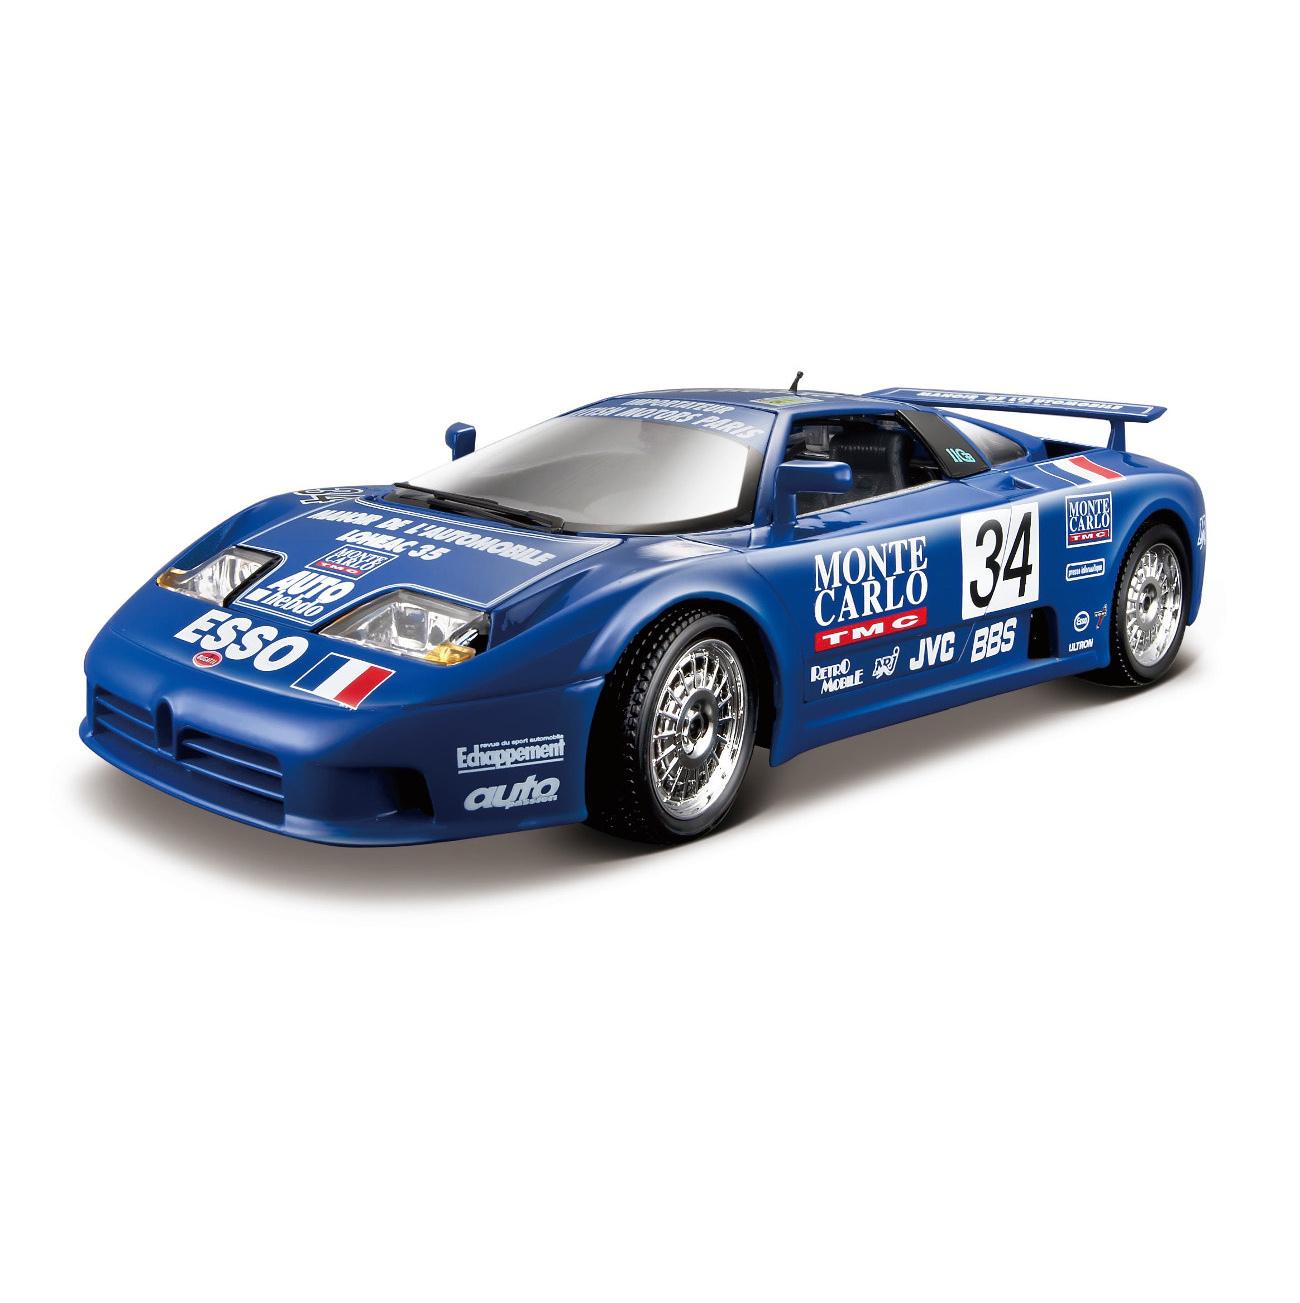 Bburago Машина металлическая Bugatti EB 110 La Minerva 1:18, 18-11039